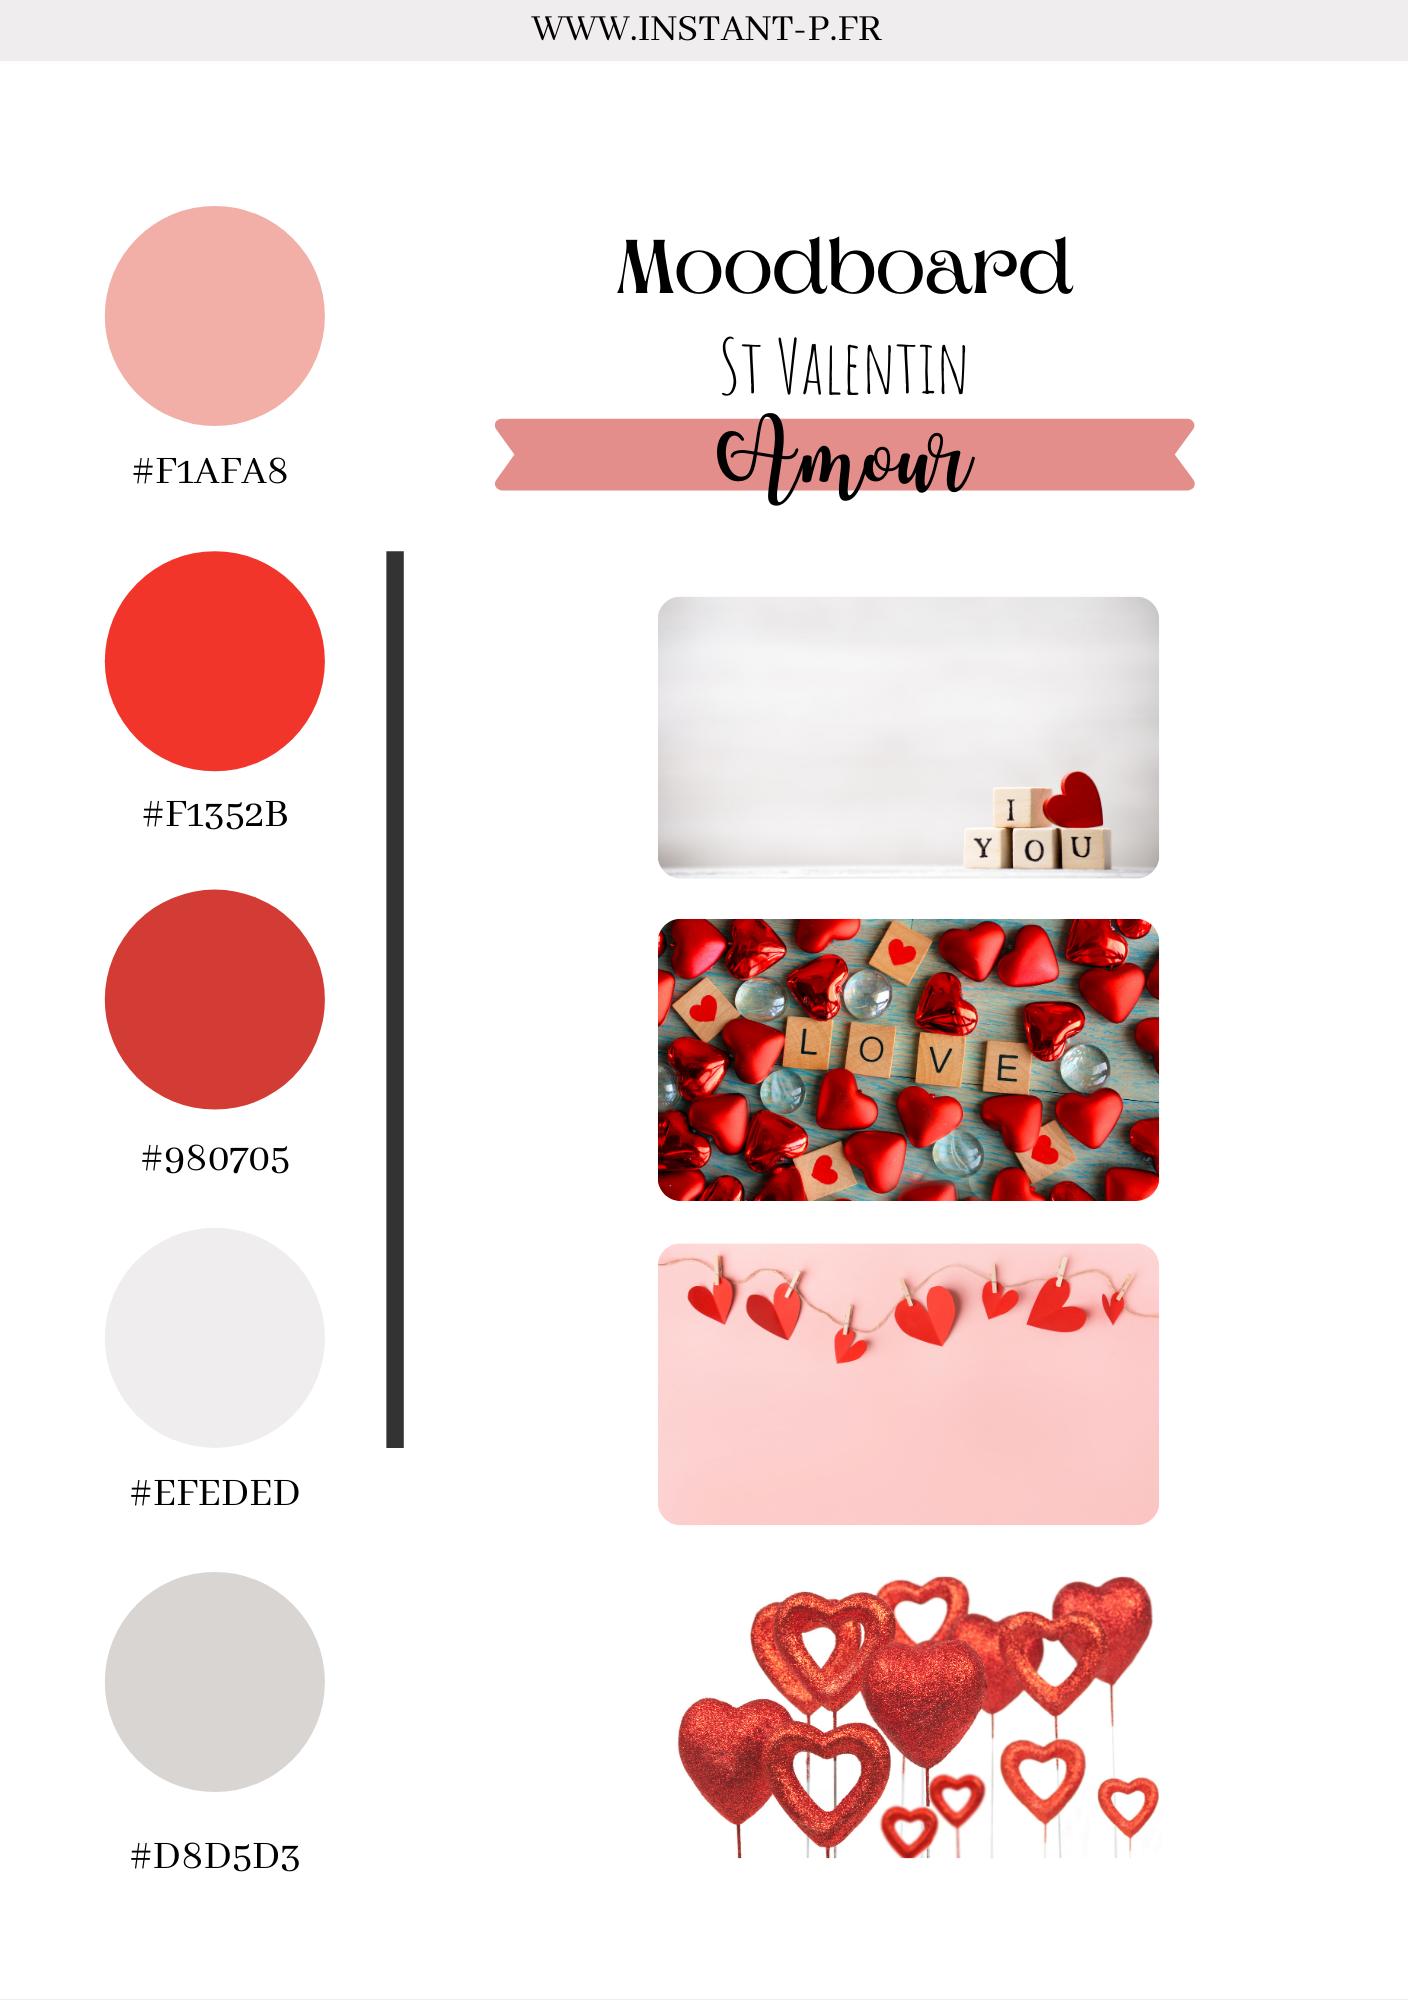 Saint-Valentin : moodboard et inspiration